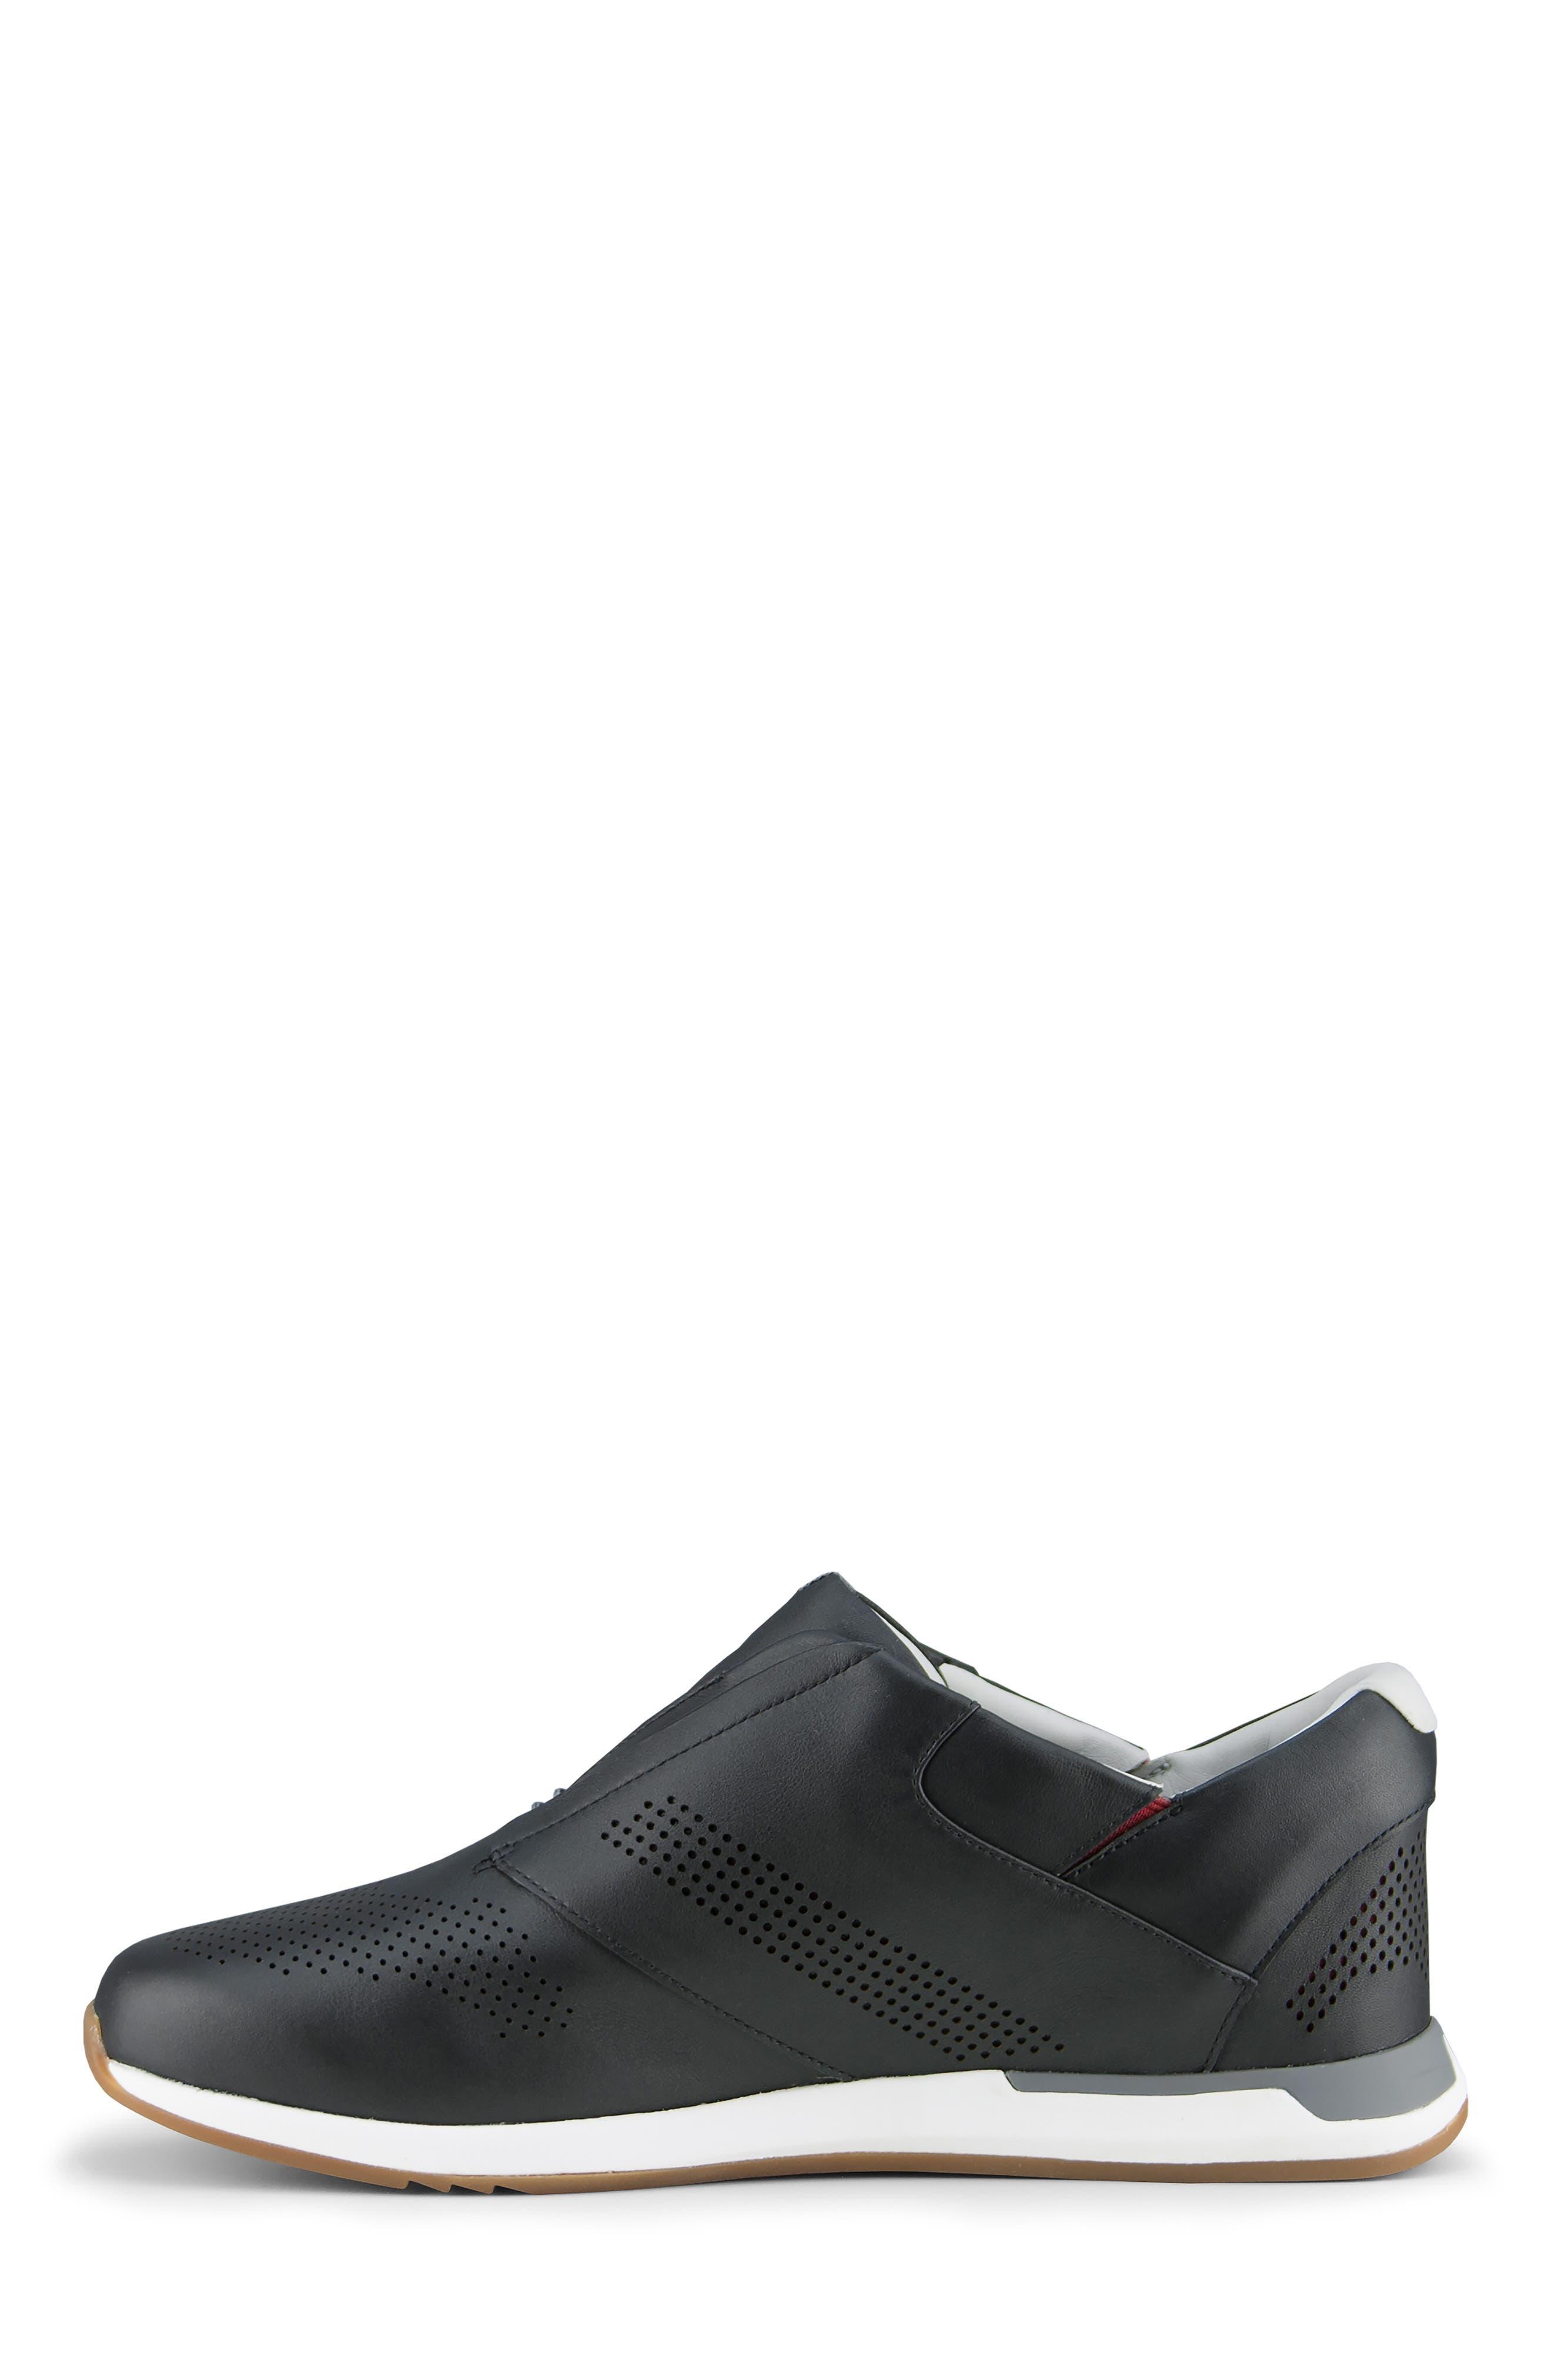 KIZIK, Dubai Slip-On Sneaker, Alternate thumbnail 7, color, BLACK LEATHER